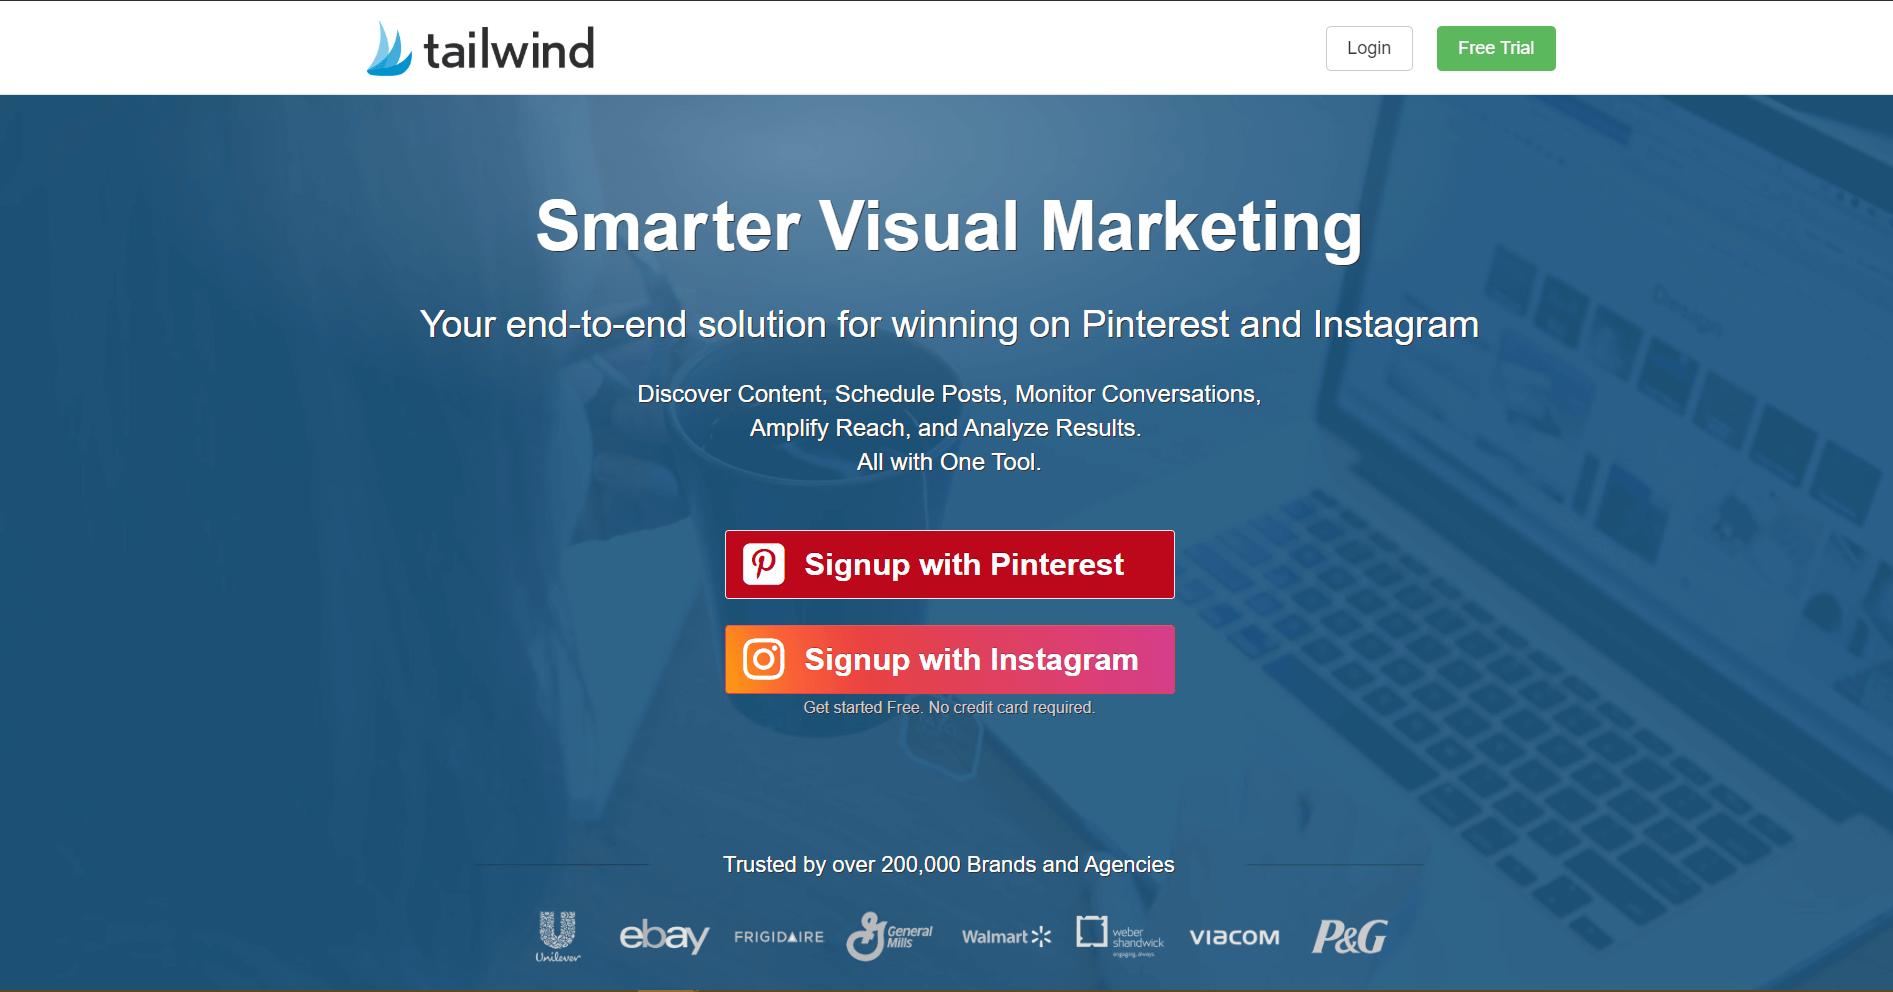 Tailwind Social Media Marketing Tool